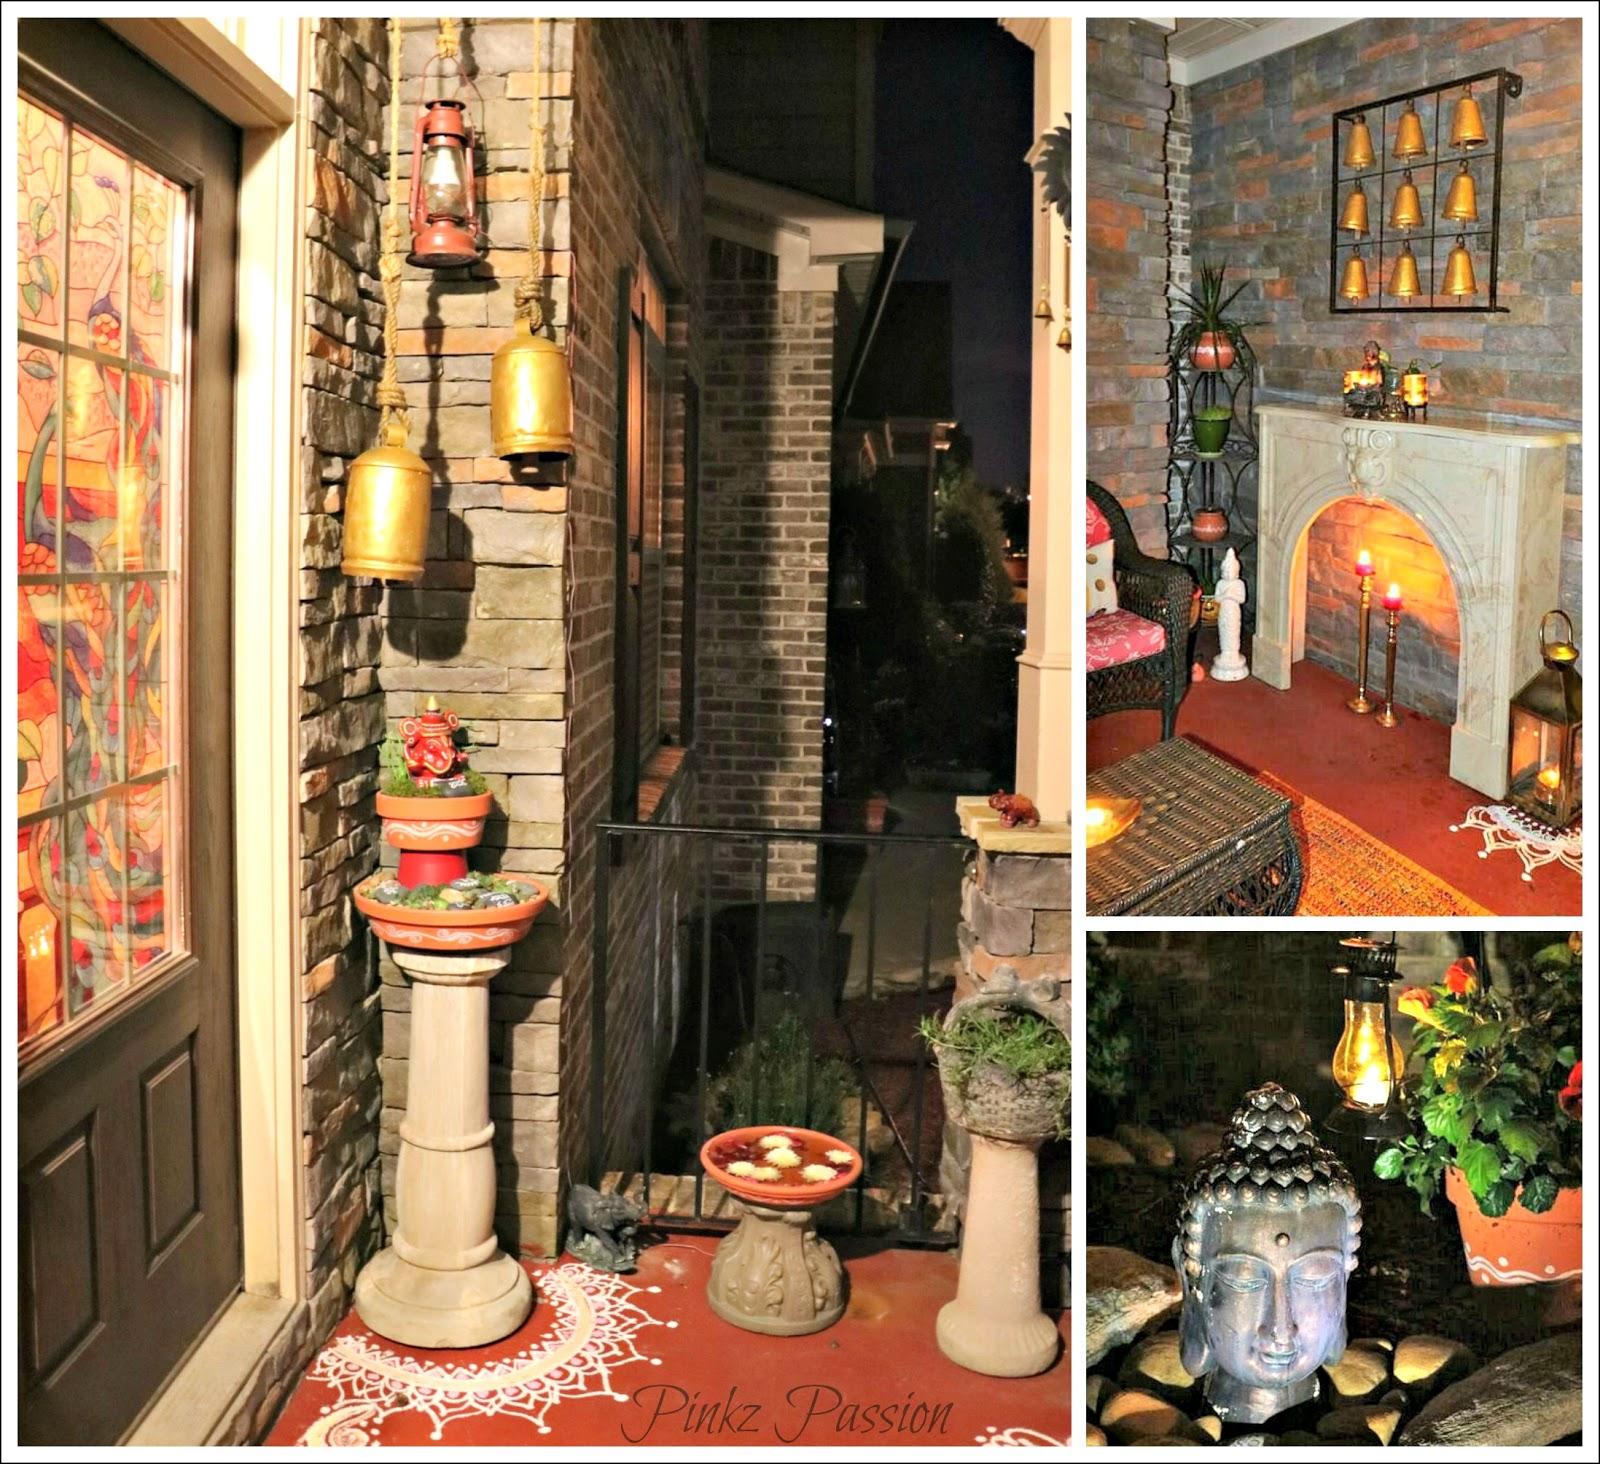 Pinkz passion harmoniously traditional home tour of padmaja rama part 1 Indian traditional home decoration ideas